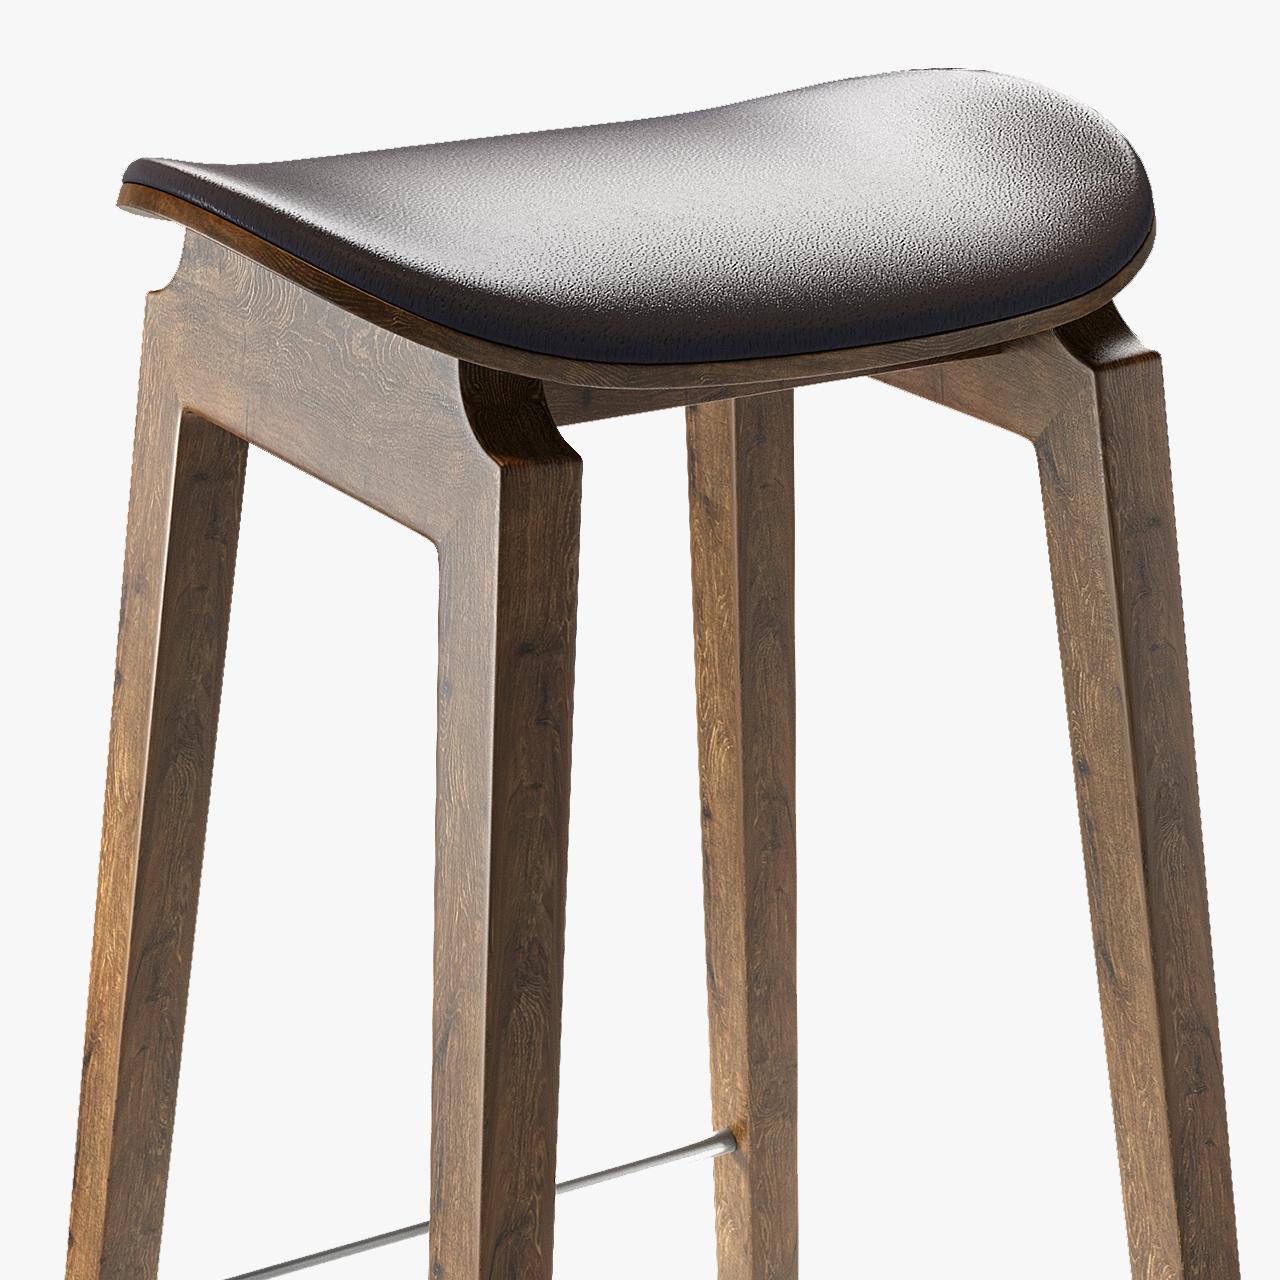 Fantastic Ny11 Bar Chair Natural Stool Modern Machost Co Dining Chair Design Ideas Machostcouk